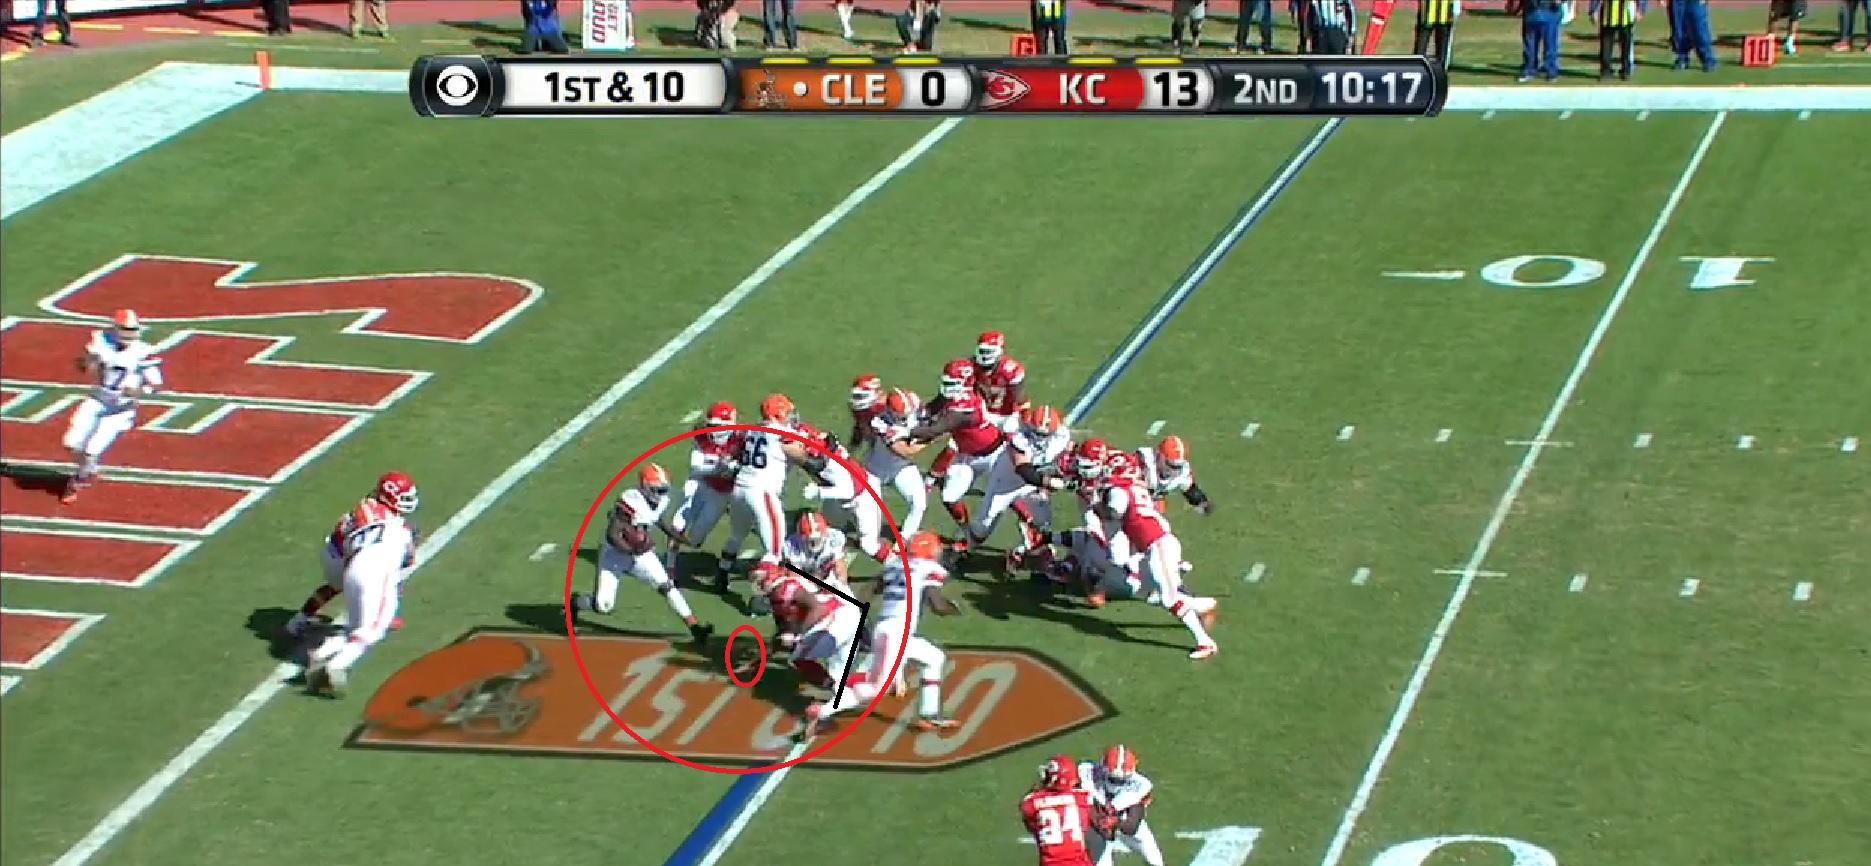 NFL Closeup: LB Derrick Johnson Taking on a Lead Block